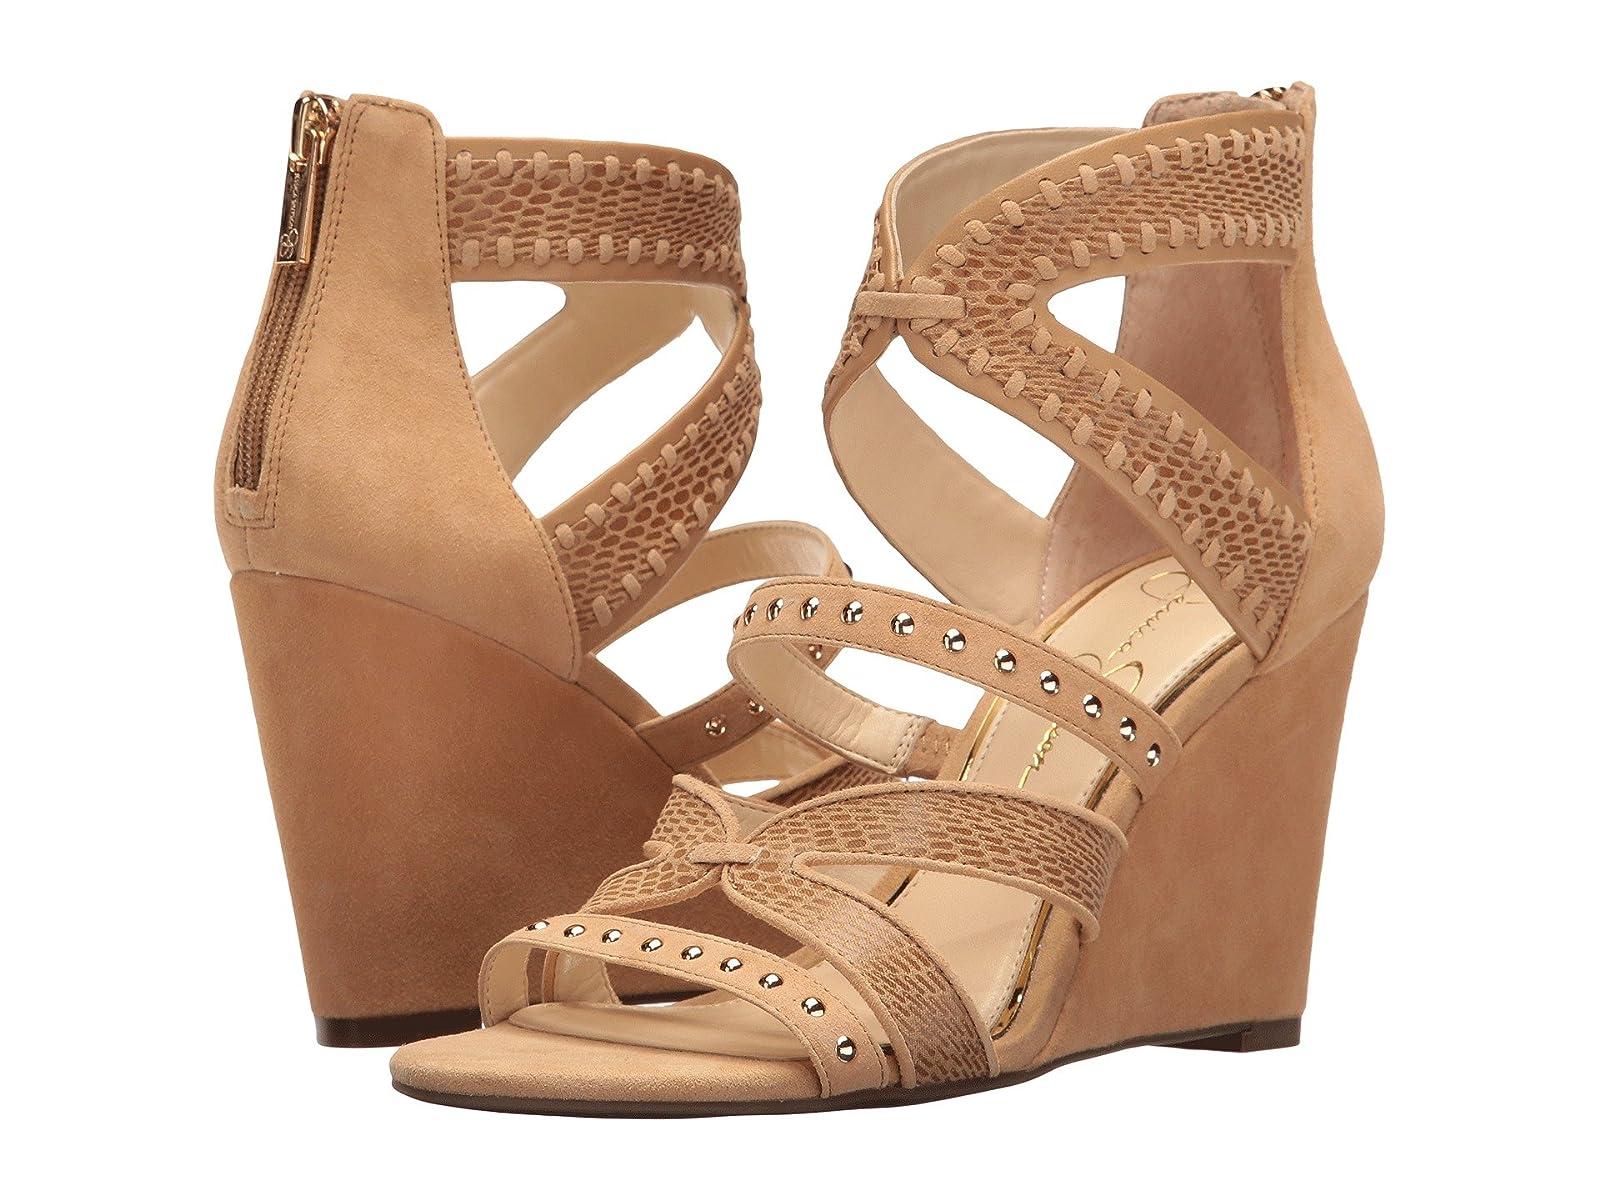 Jessica Simpson ZenoliaCheap and distinctive eye-catching shoes